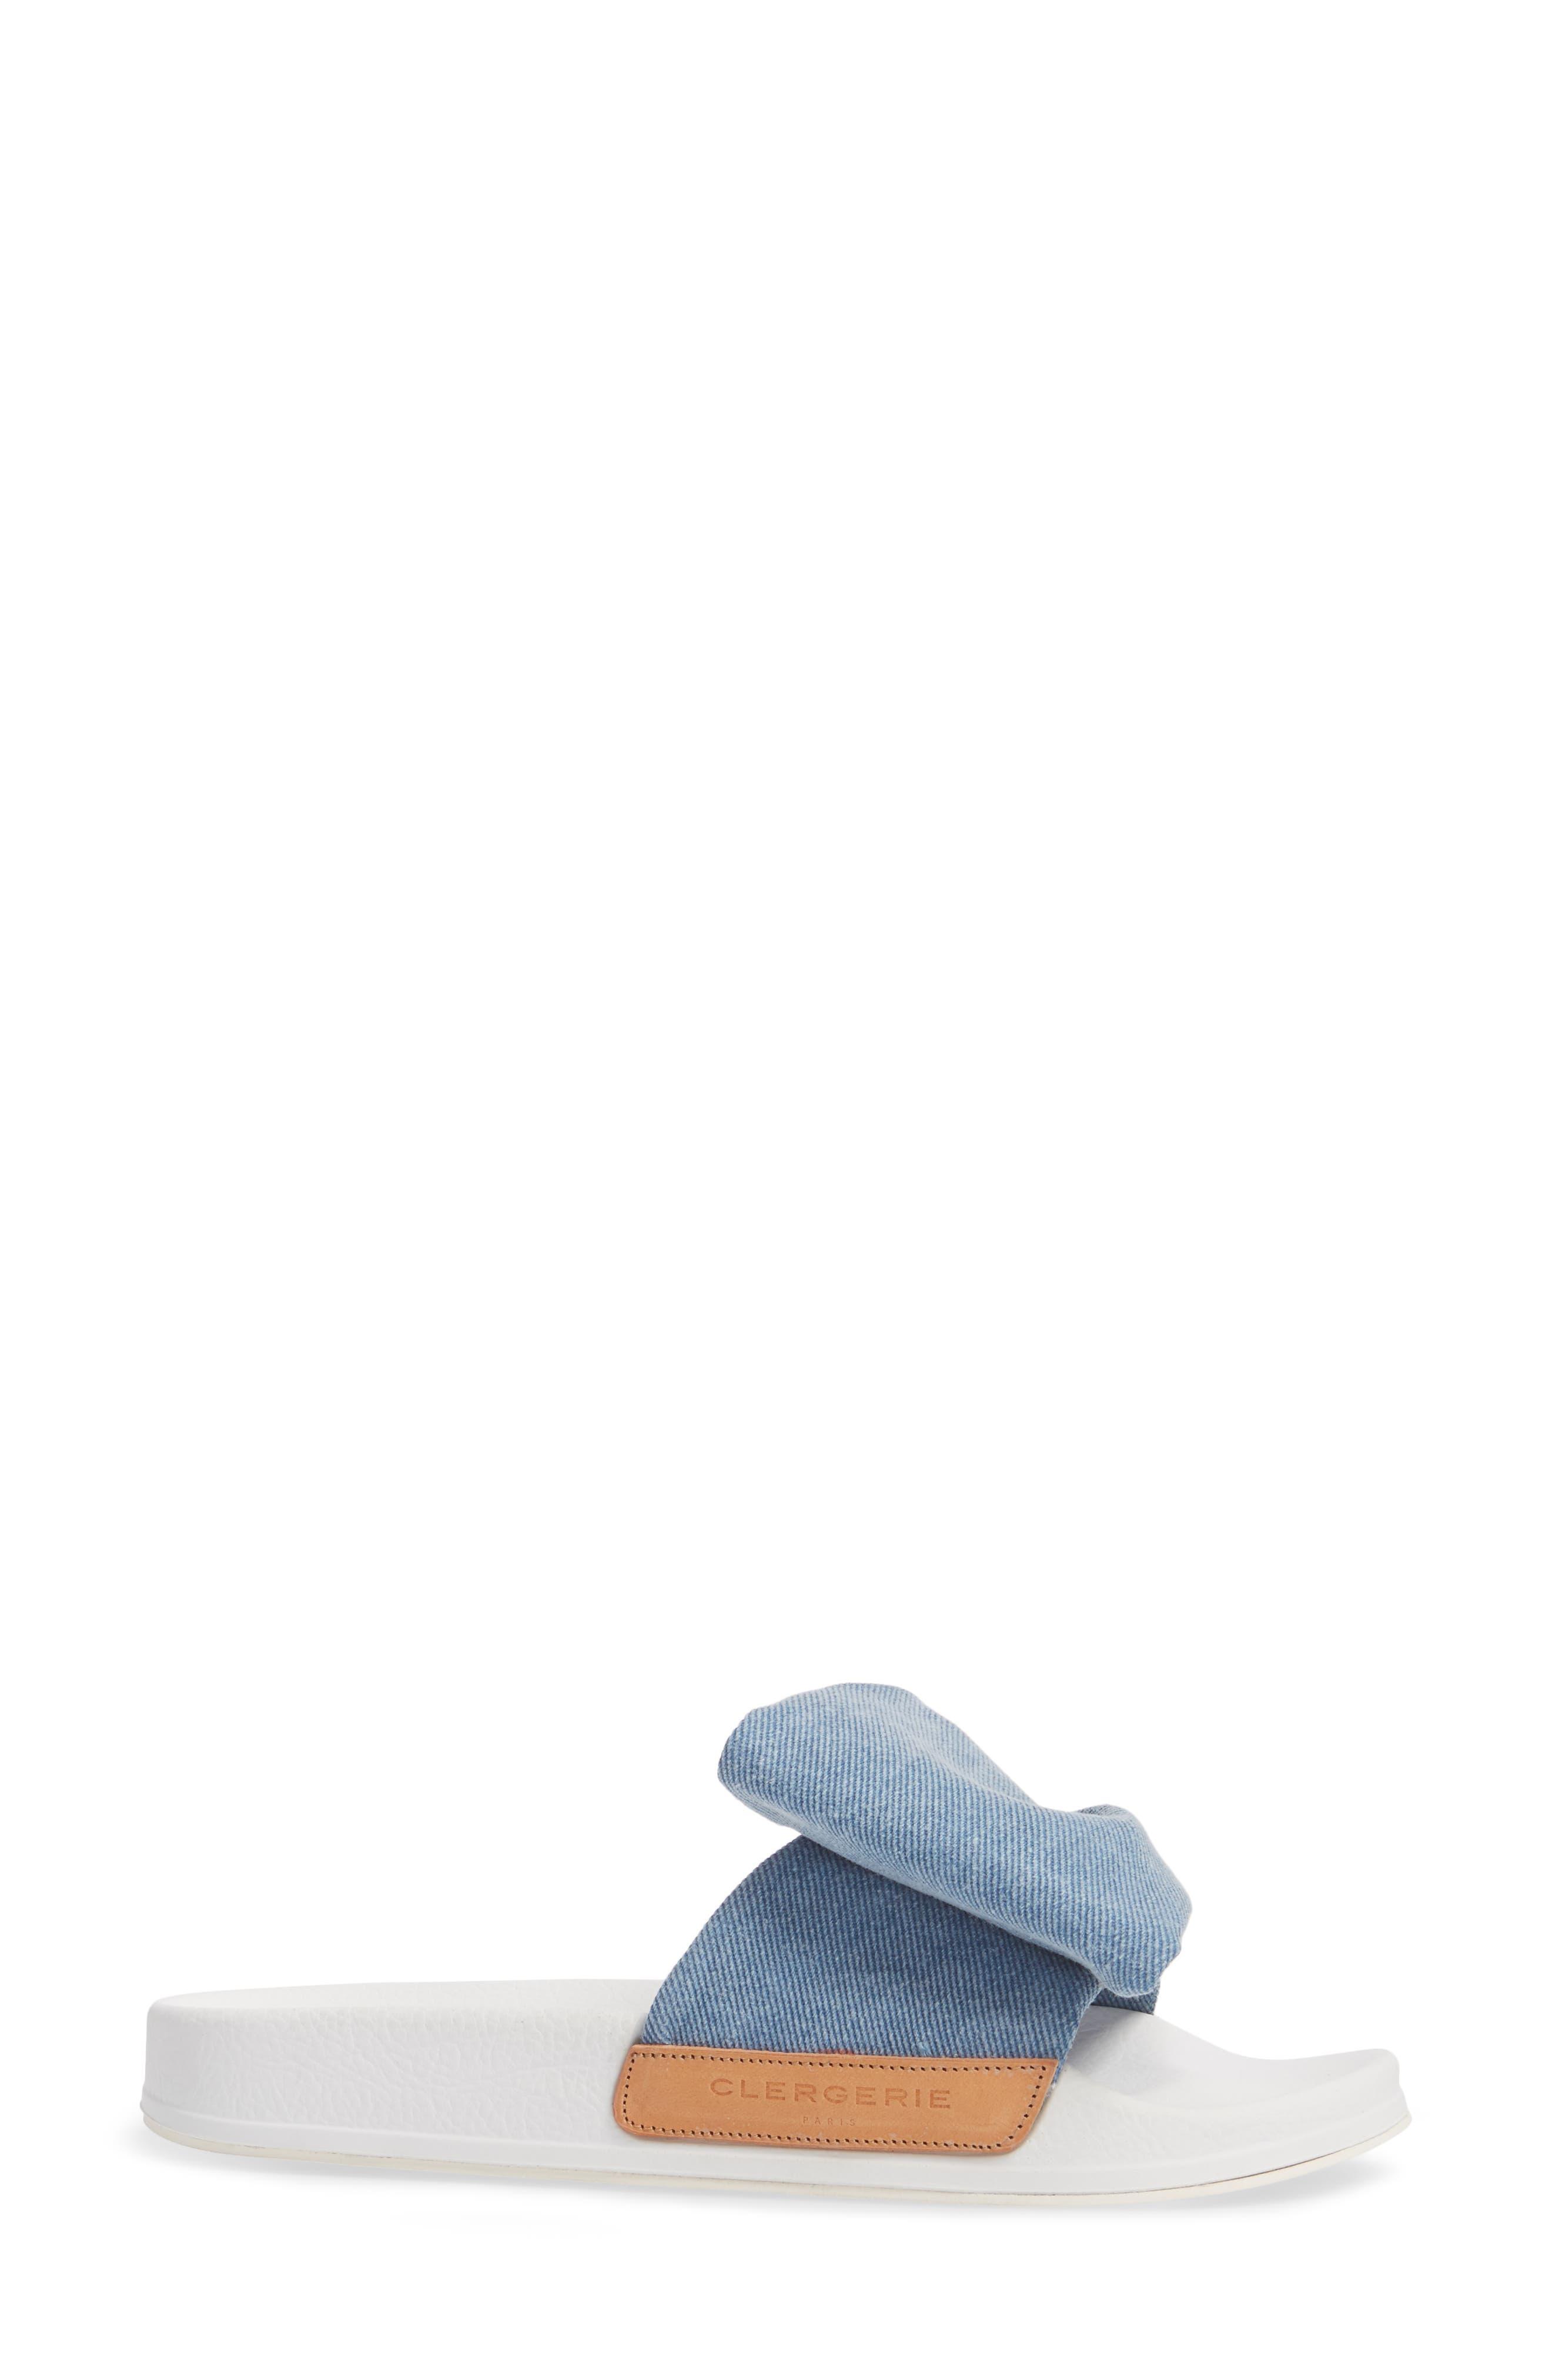 Wendyd Slide Sandal,                             Alternate thumbnail 3, color,                             400